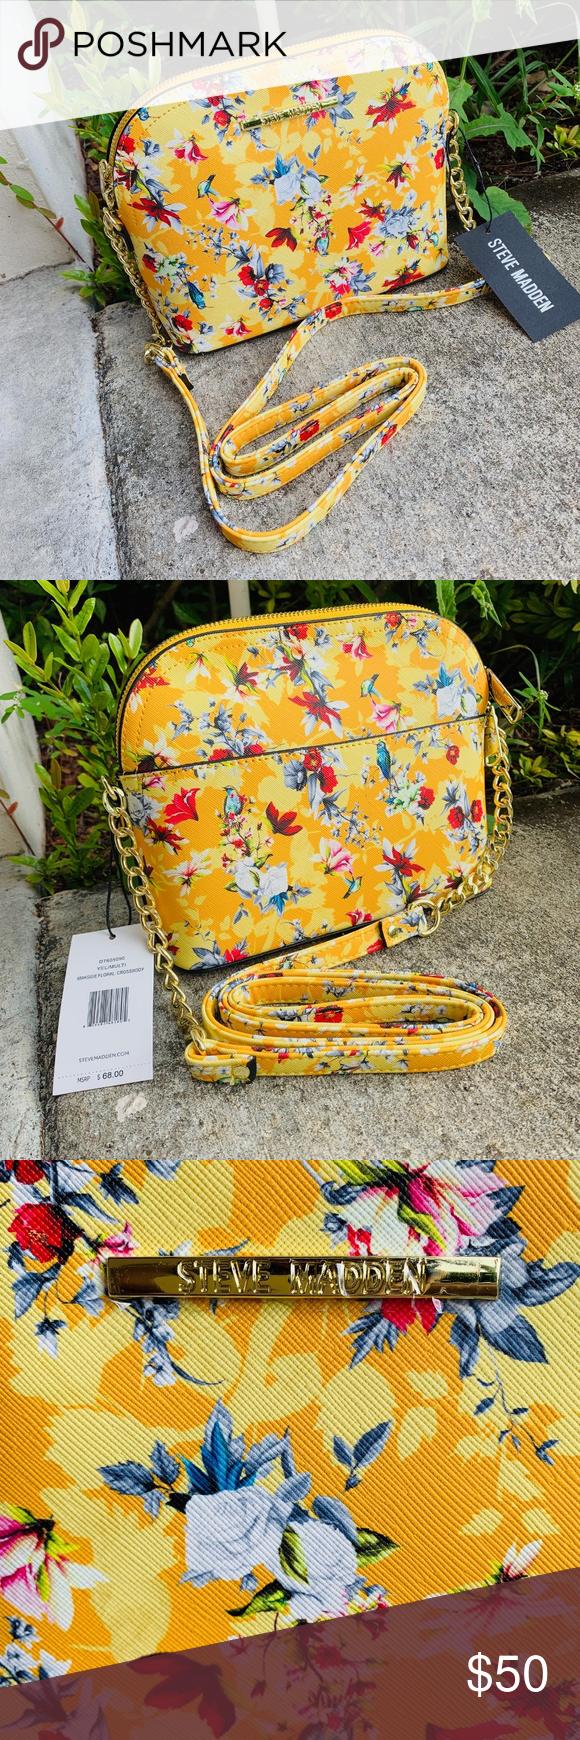 4613661791 NWT STEVE MADDEN FLORAL CROSSBODY MAGGIE BAG PURSE NWT STEVE MADDEN Black  Maggie Floral Crossbody💐